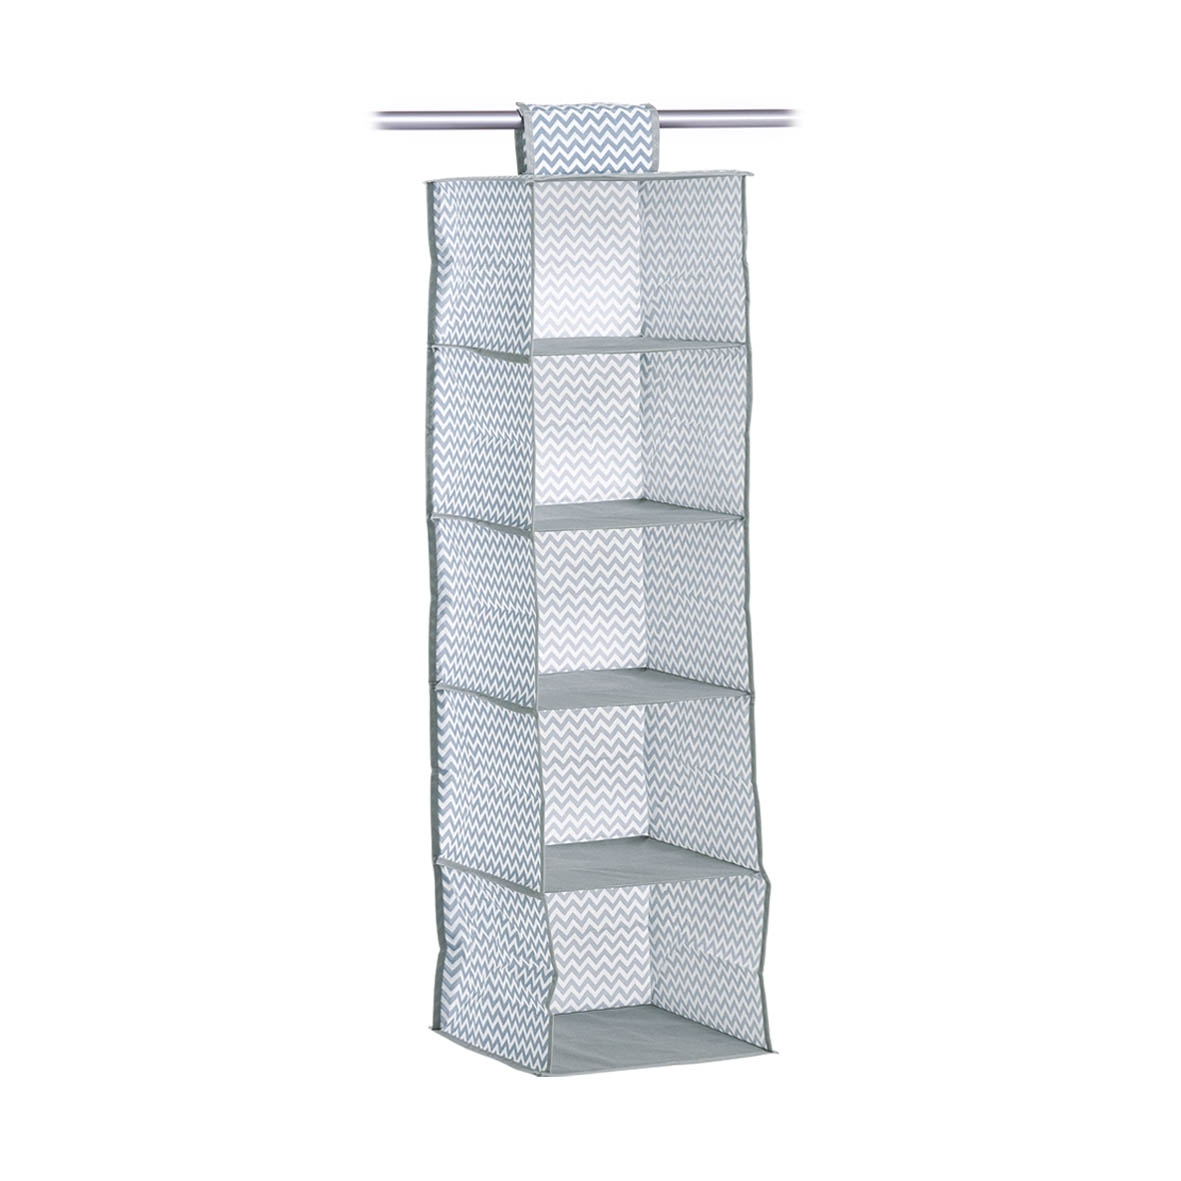 Organizator textil pentru dulap, Alb / Gri Zig Zag, l28xA28xH95 cm